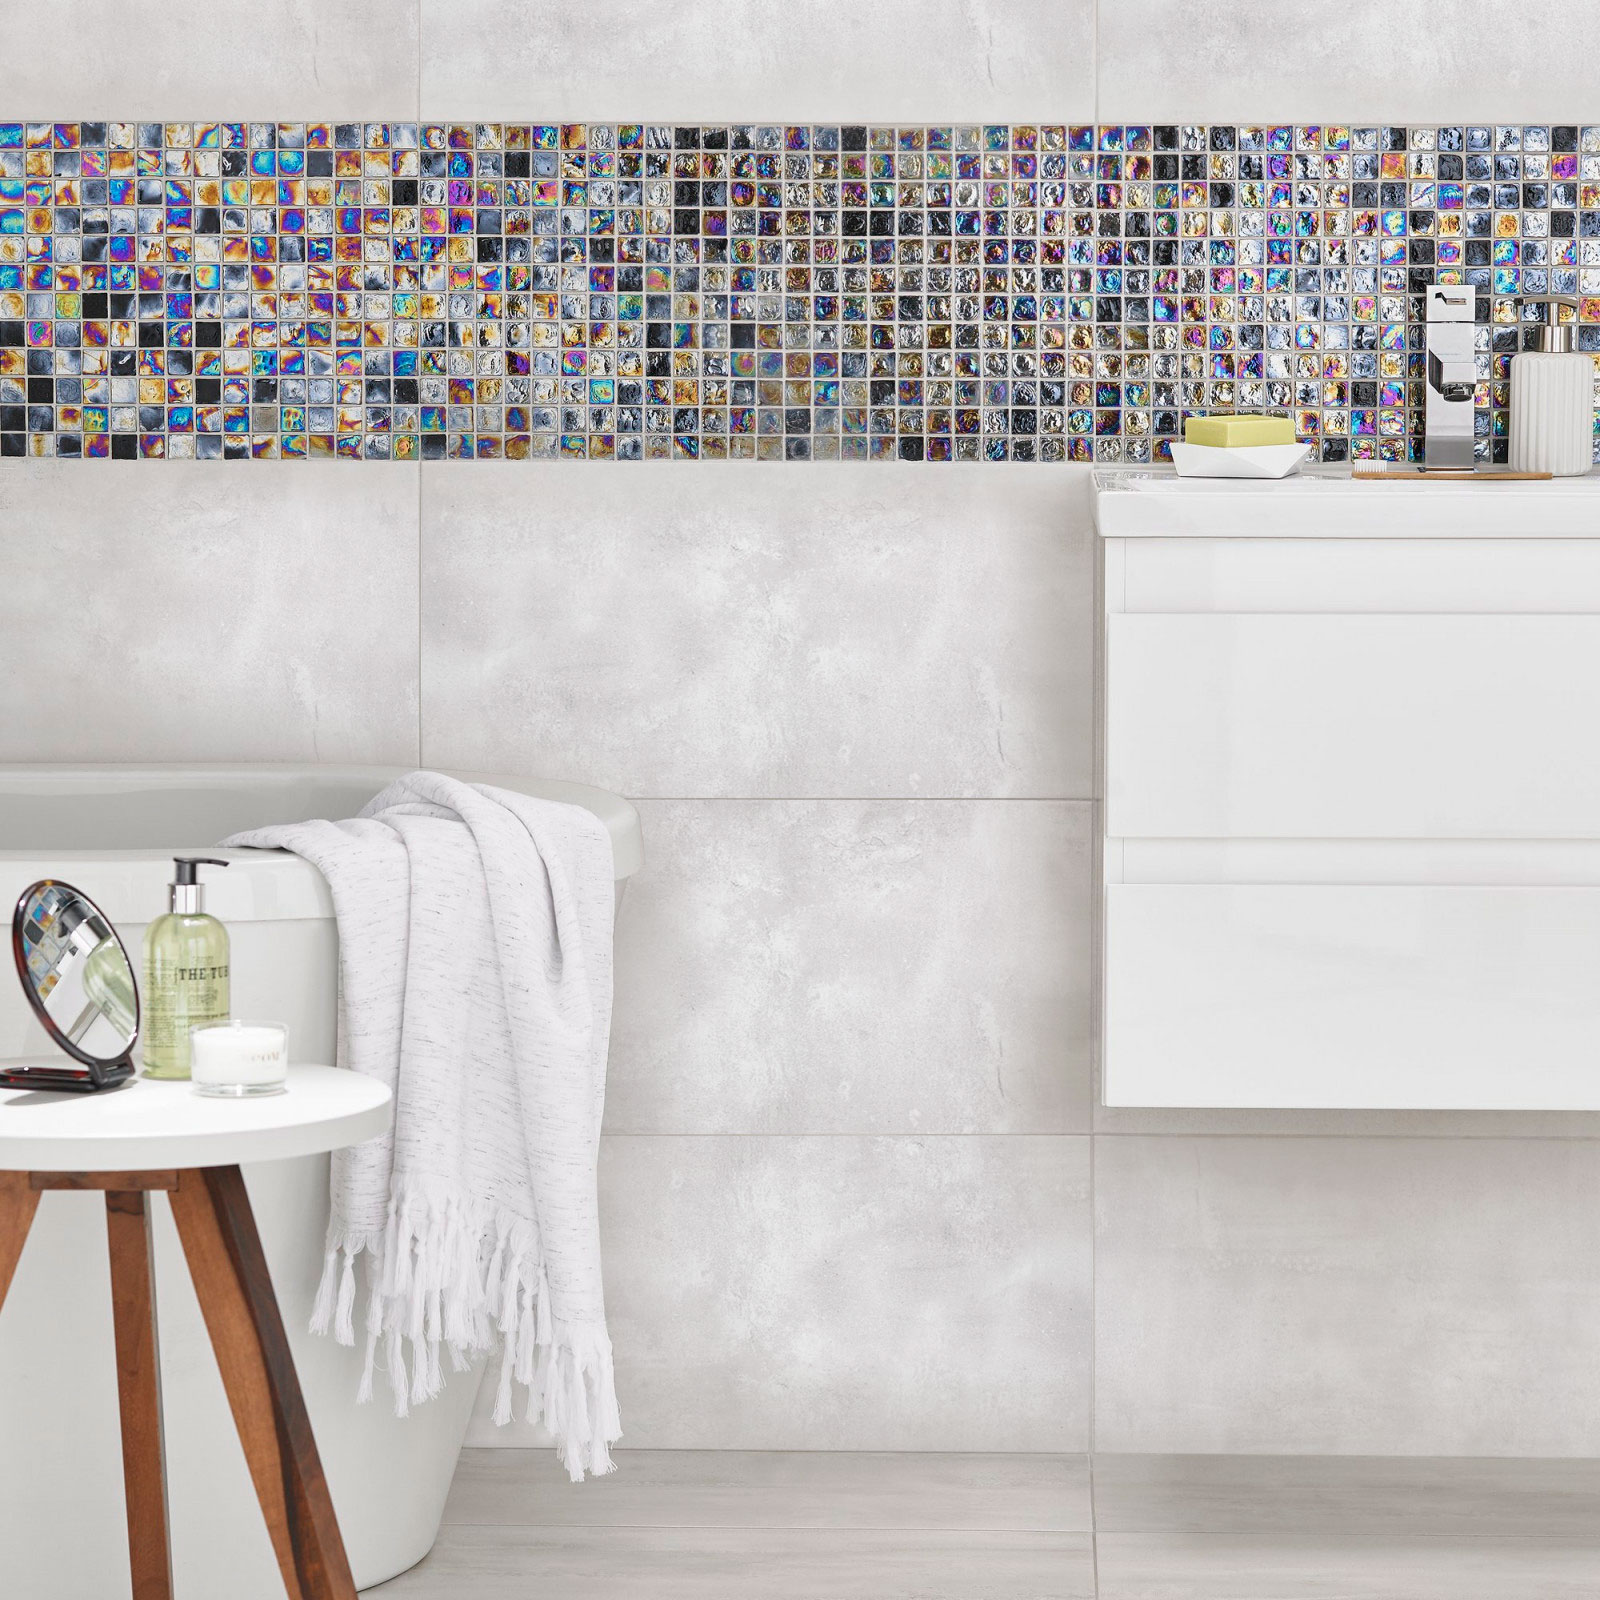 Cemento Canberra High Gloss porcelain tiles